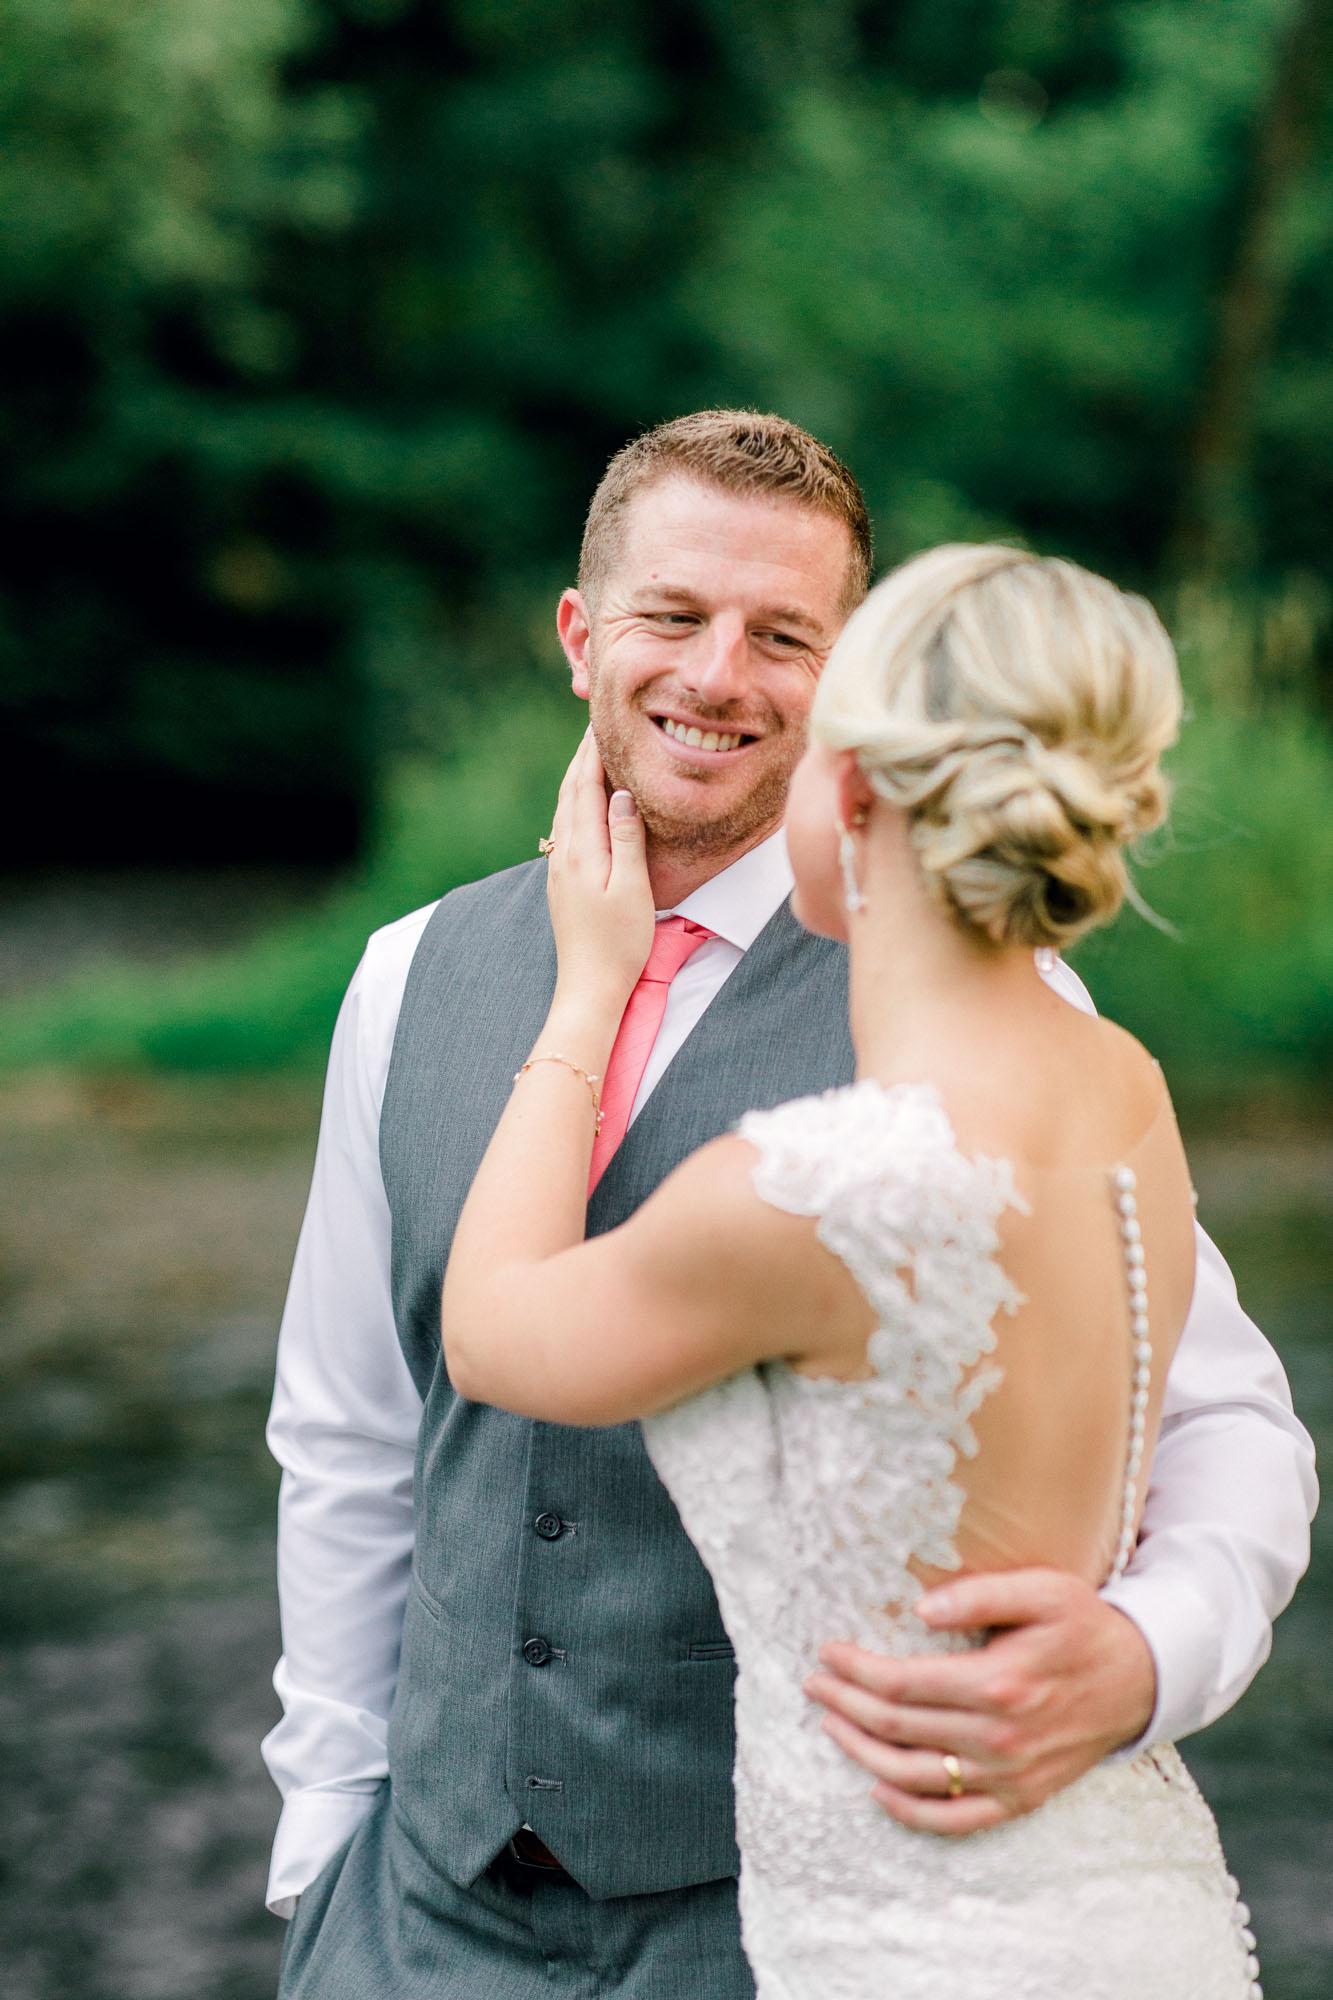 Allenberry-resort-historic-pennsylvania-wedding-22530.jpg